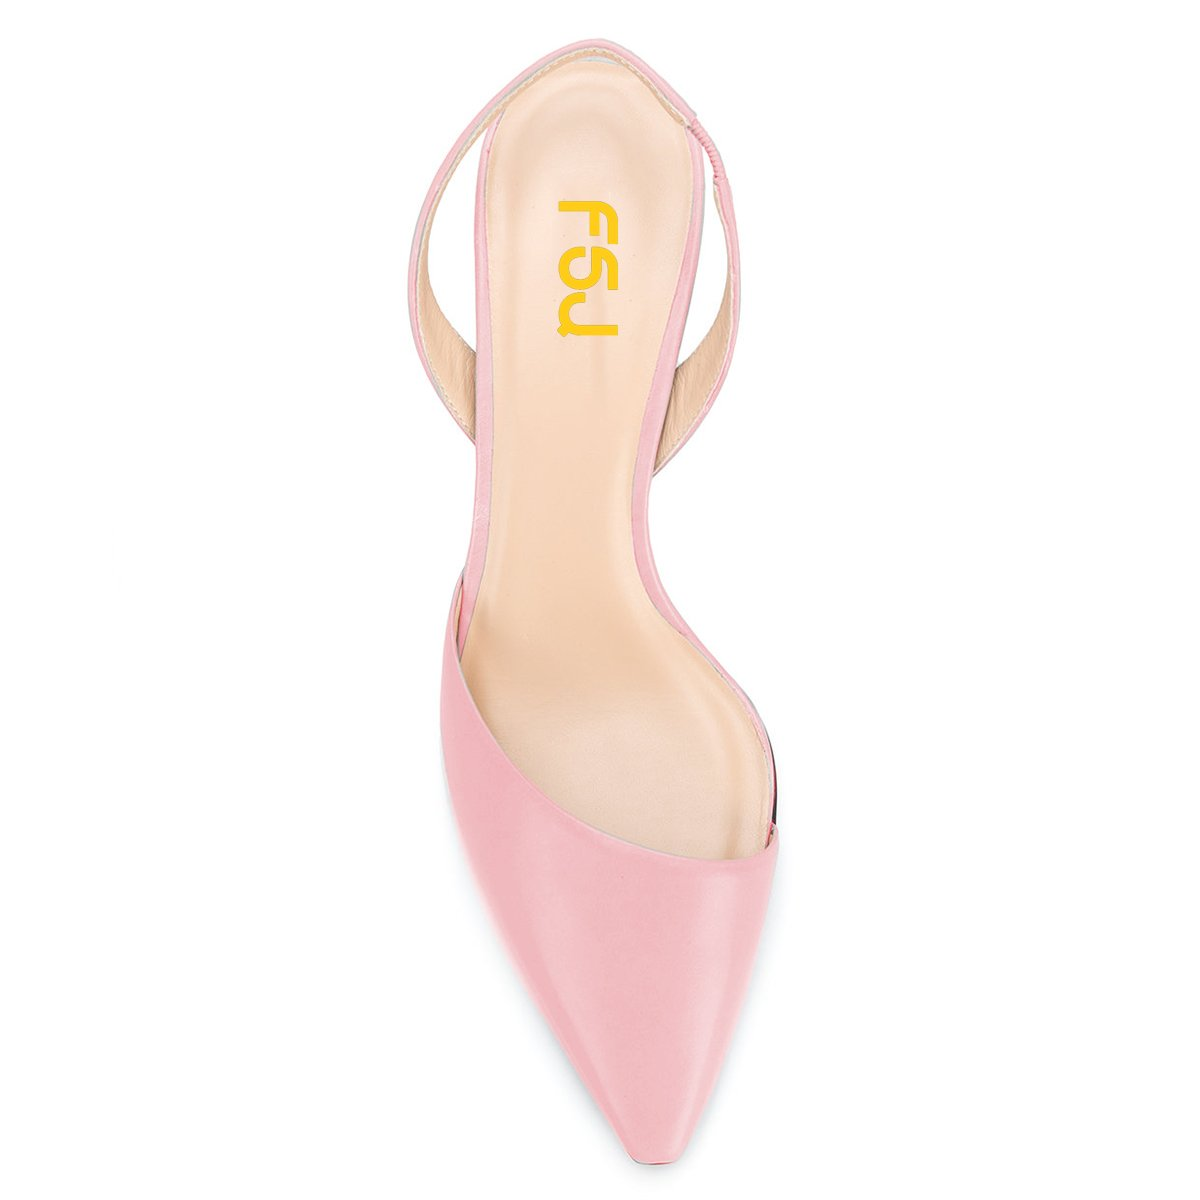 FSJ Women Classic Pointy Toe Pumps Chunky Mid Heels Slingback Sandals Comfortable Shoes Size 4-15 US B07BXVS6XT 8 B(M) US Pink